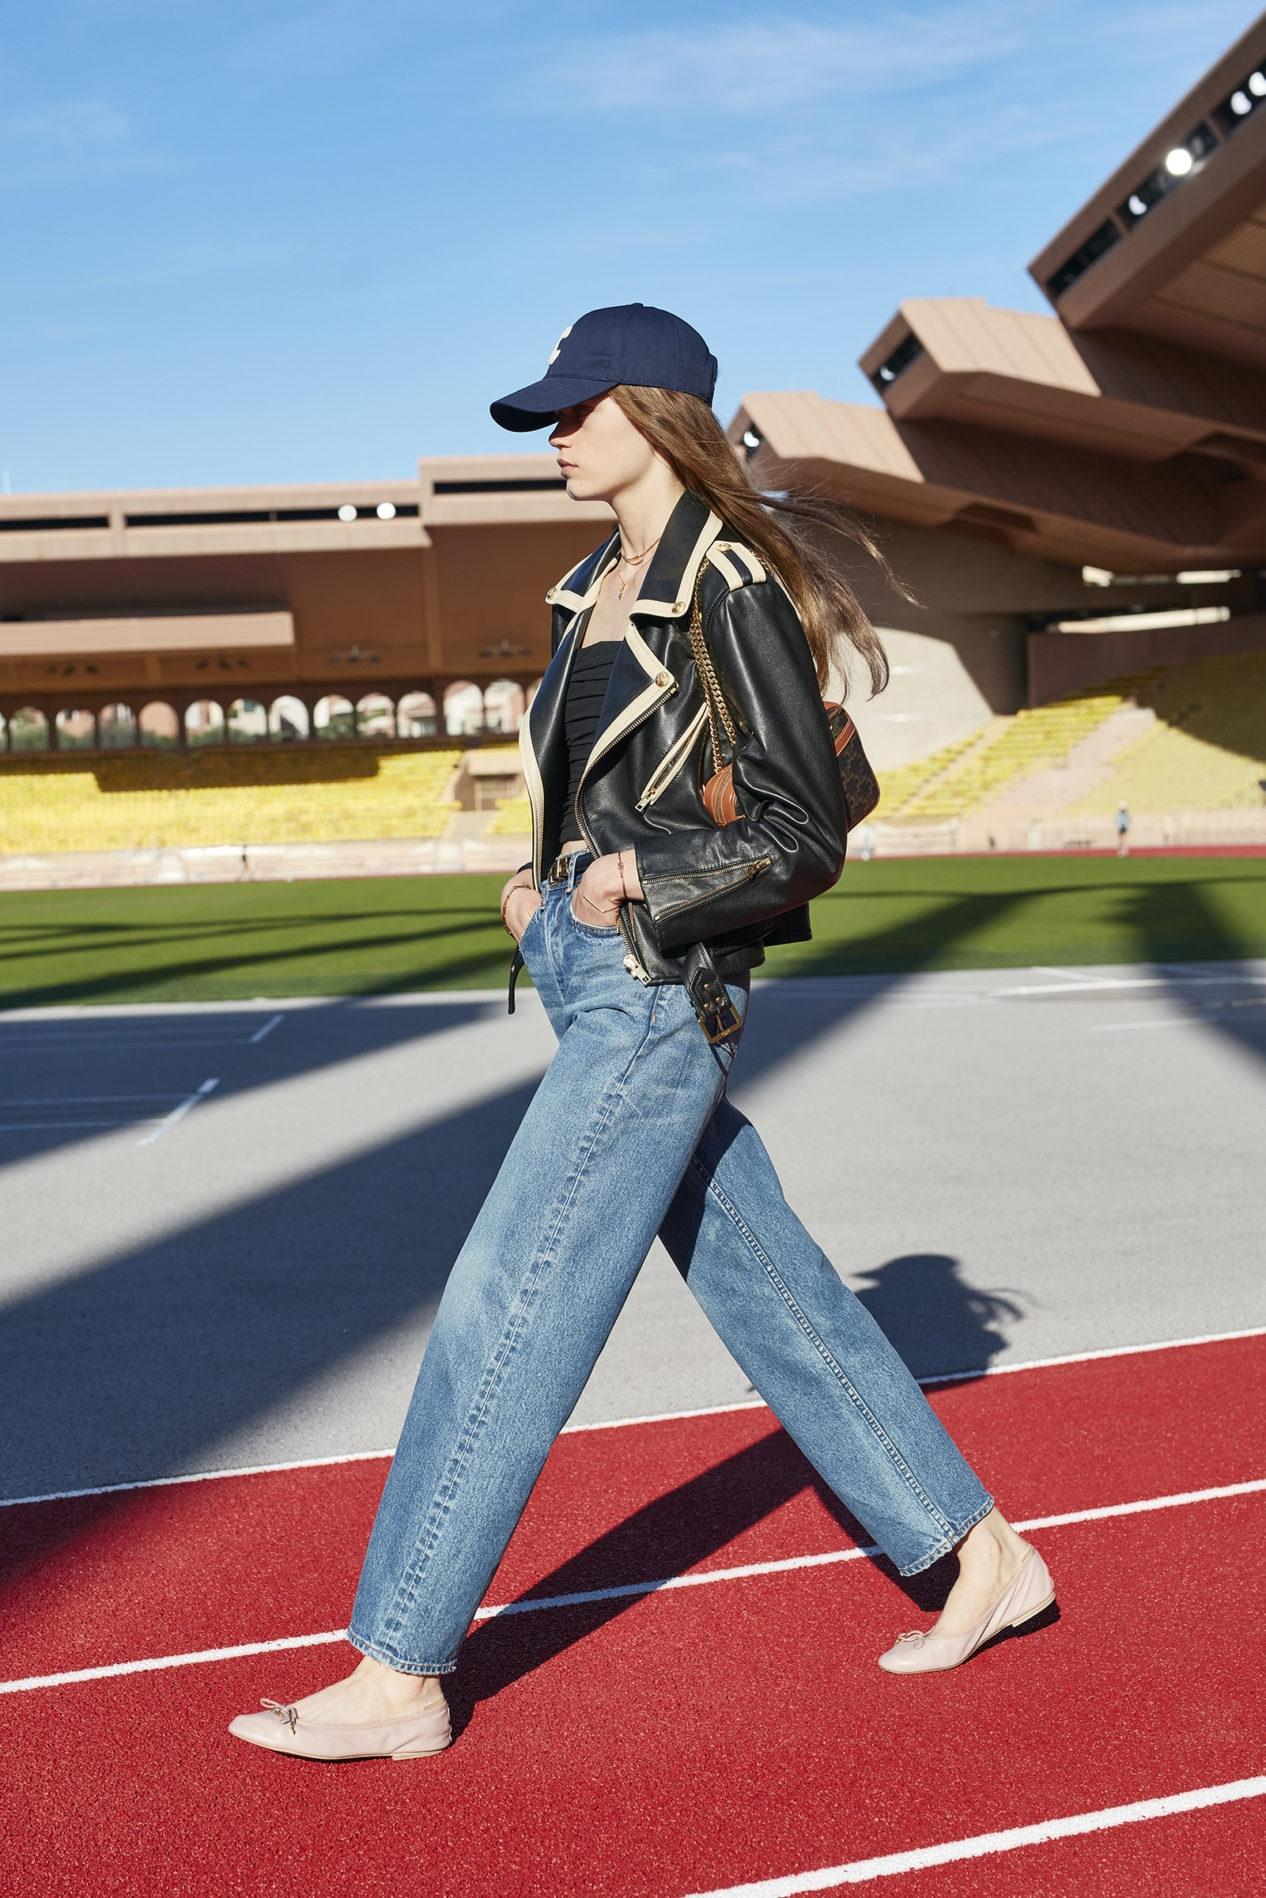 Французская романтика и спорт: Celine показали новую коллекцию весна-лето 2021 (ФОТО) - фото №6